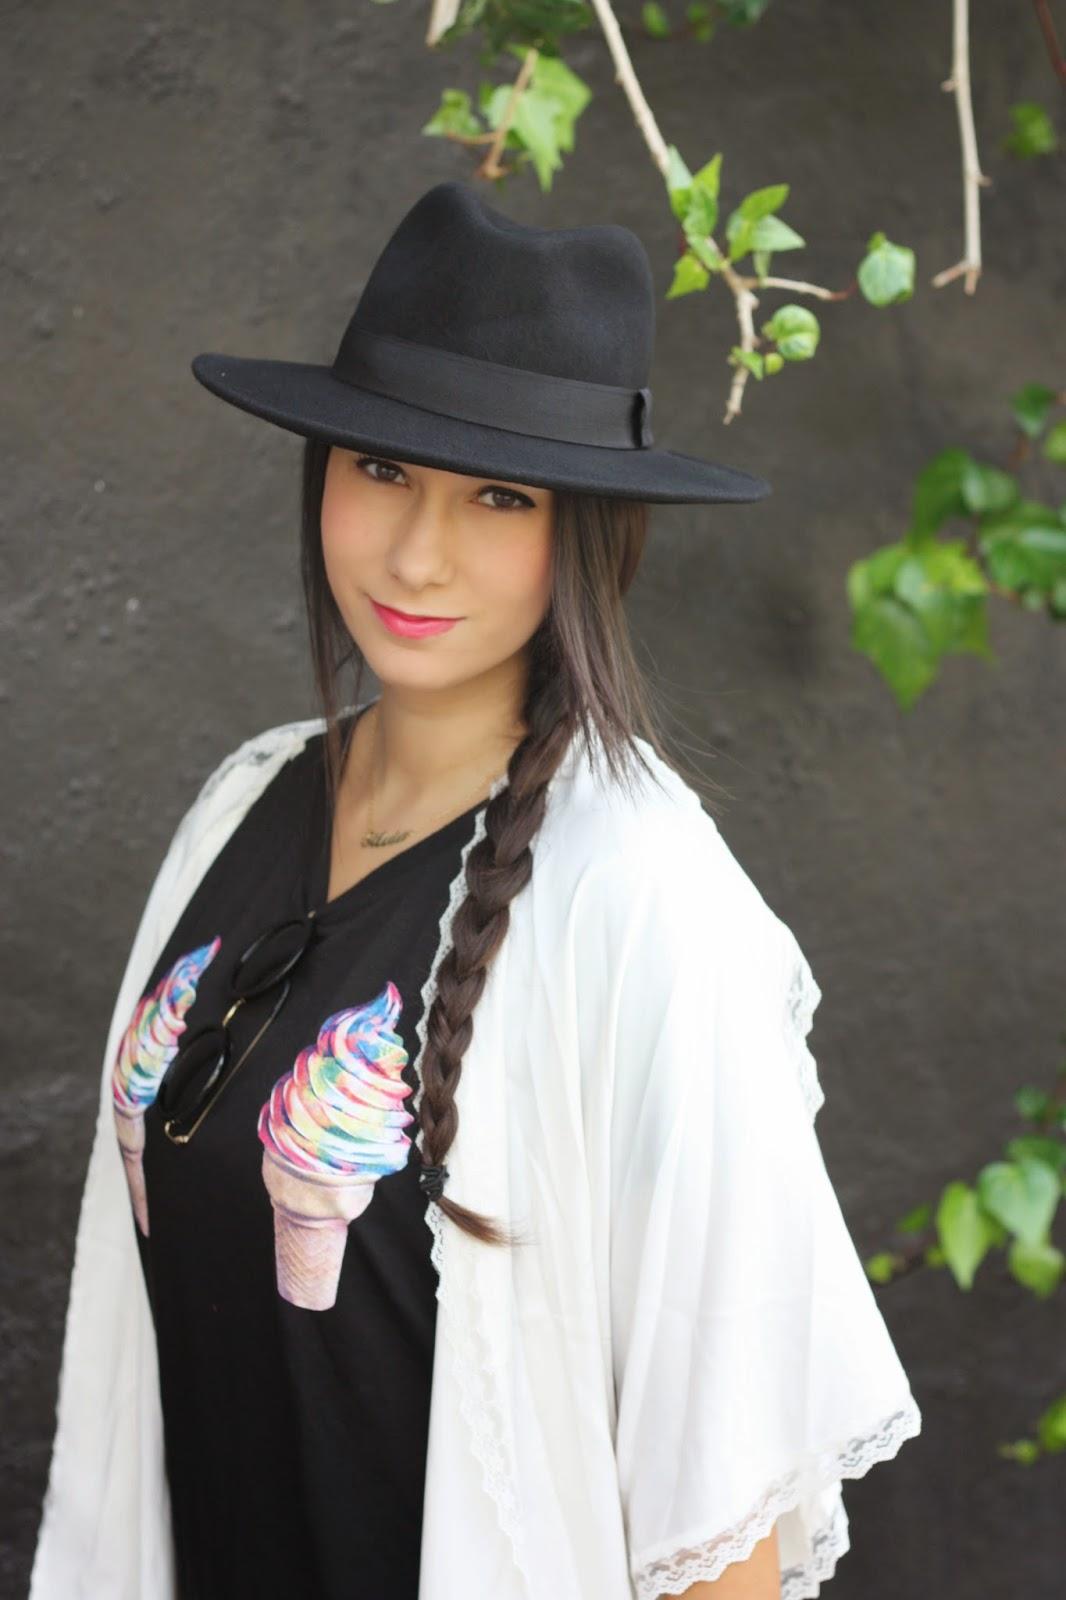 http://silviparalasamigas.blogspot.com.es/2014/10/camiseta-helados.html